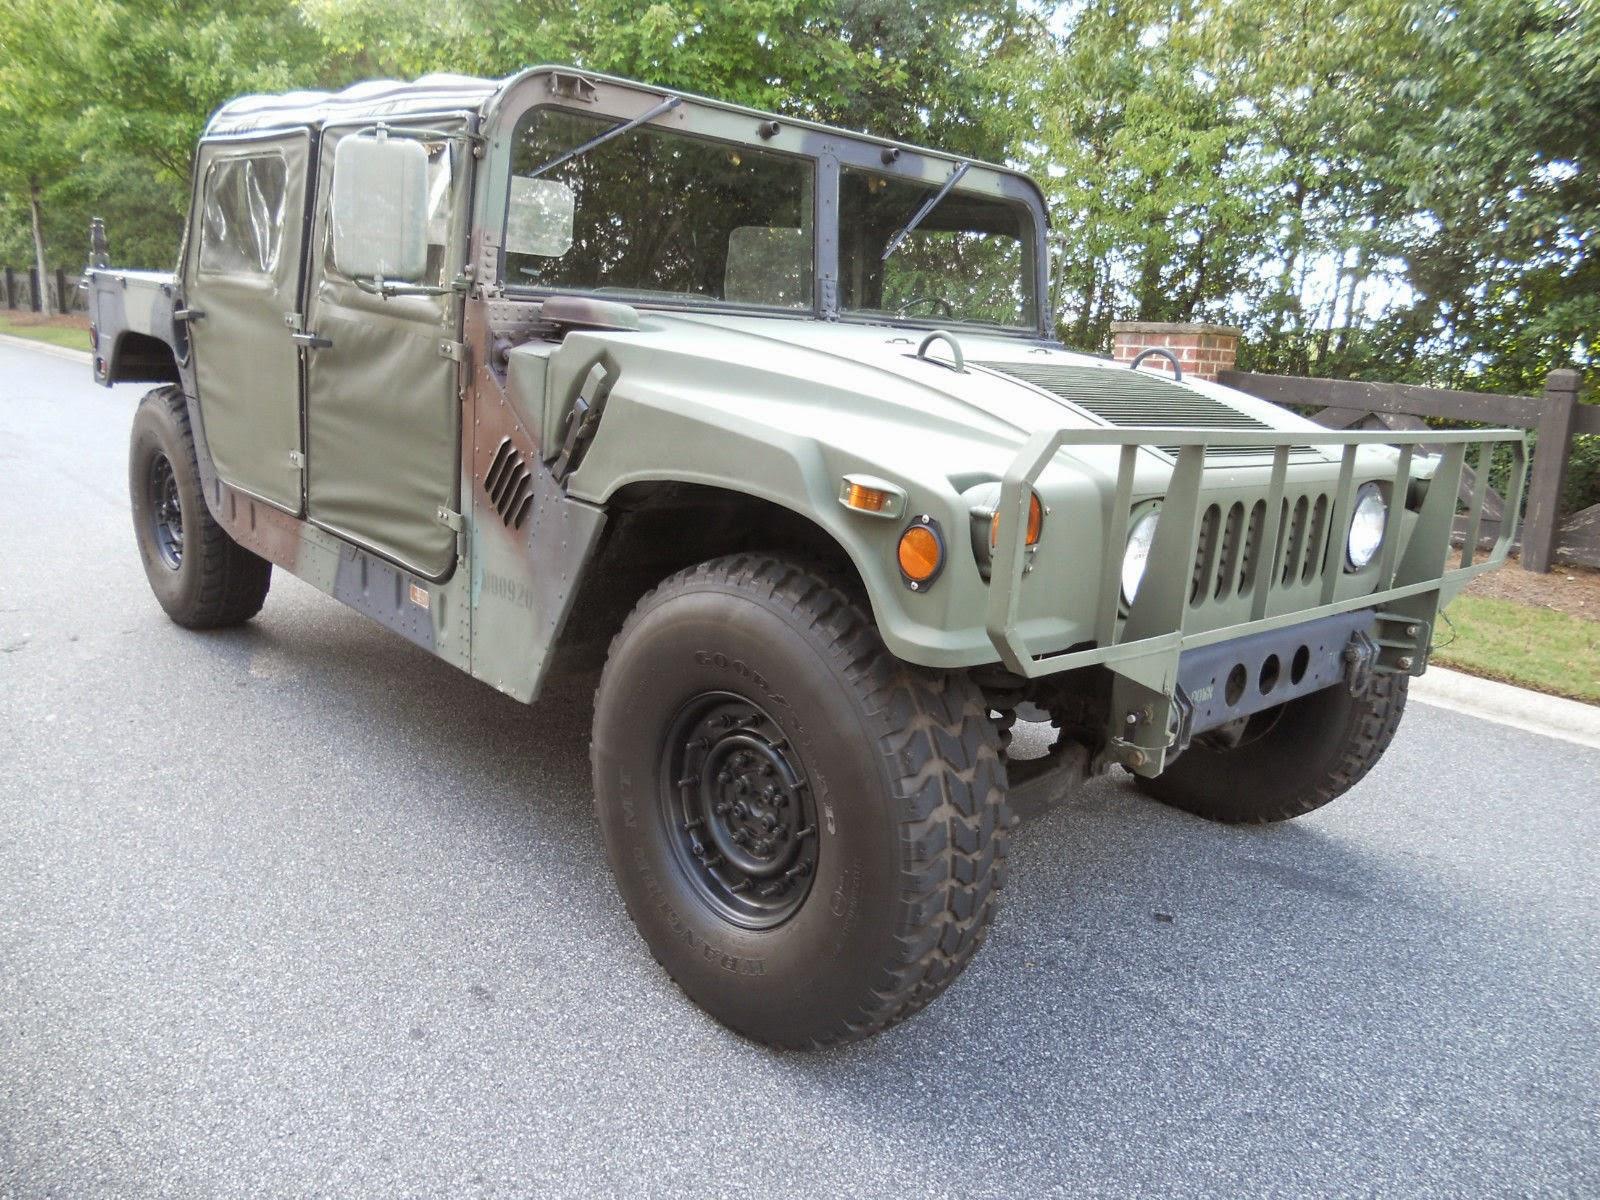 1985 m998 military humvee for sale 4x4 cars. Black Bedroom Furniture Sets. Home Design Ideas